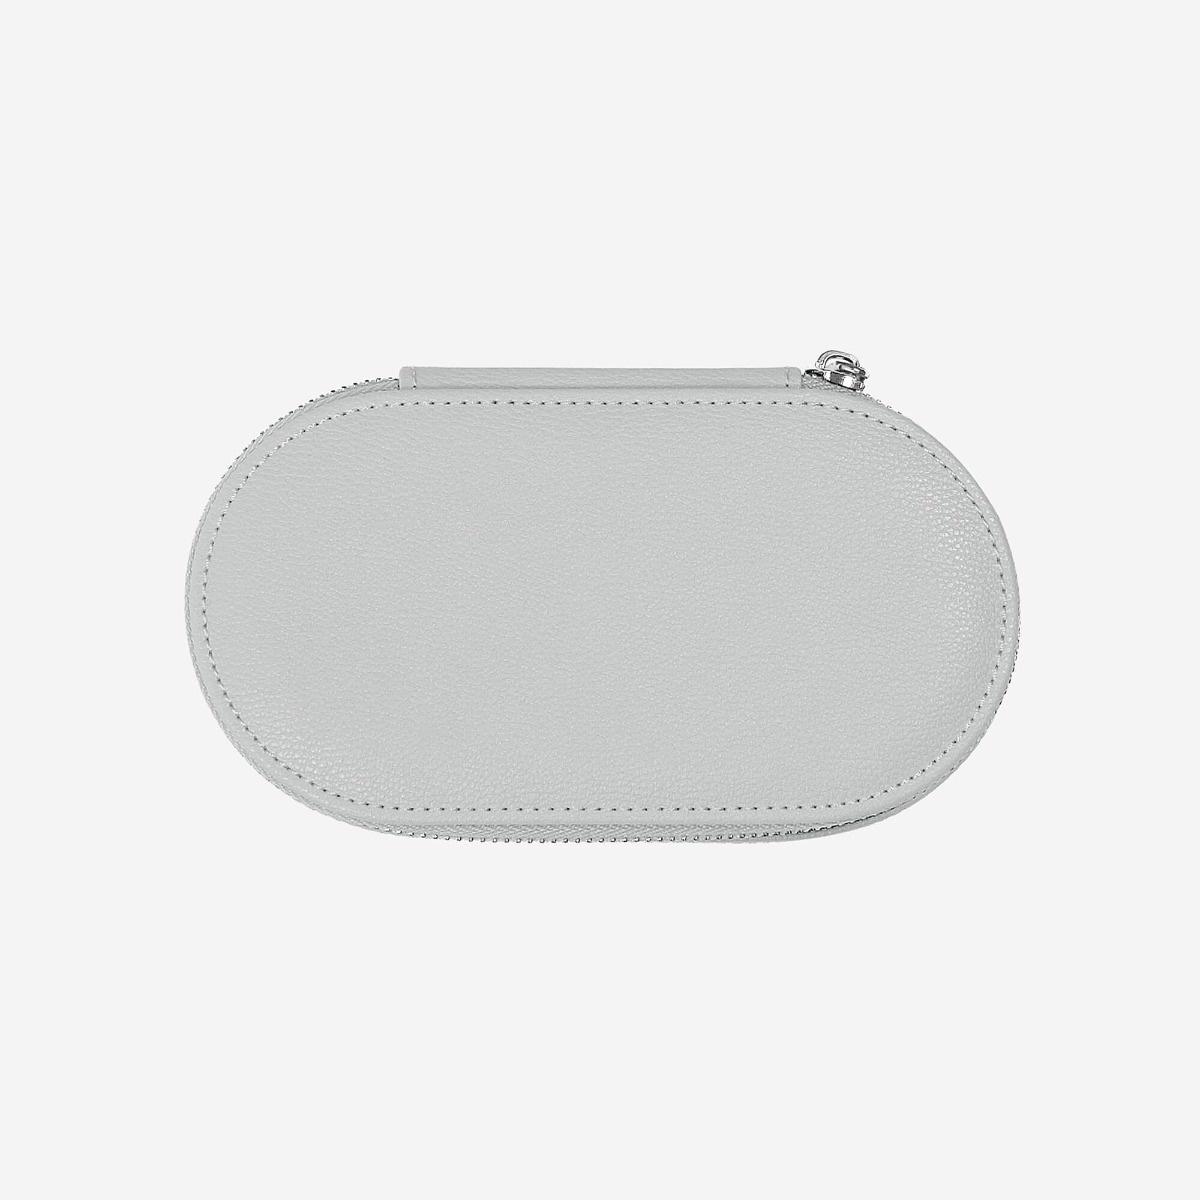 Schmuckkasten oval Pebble Grey